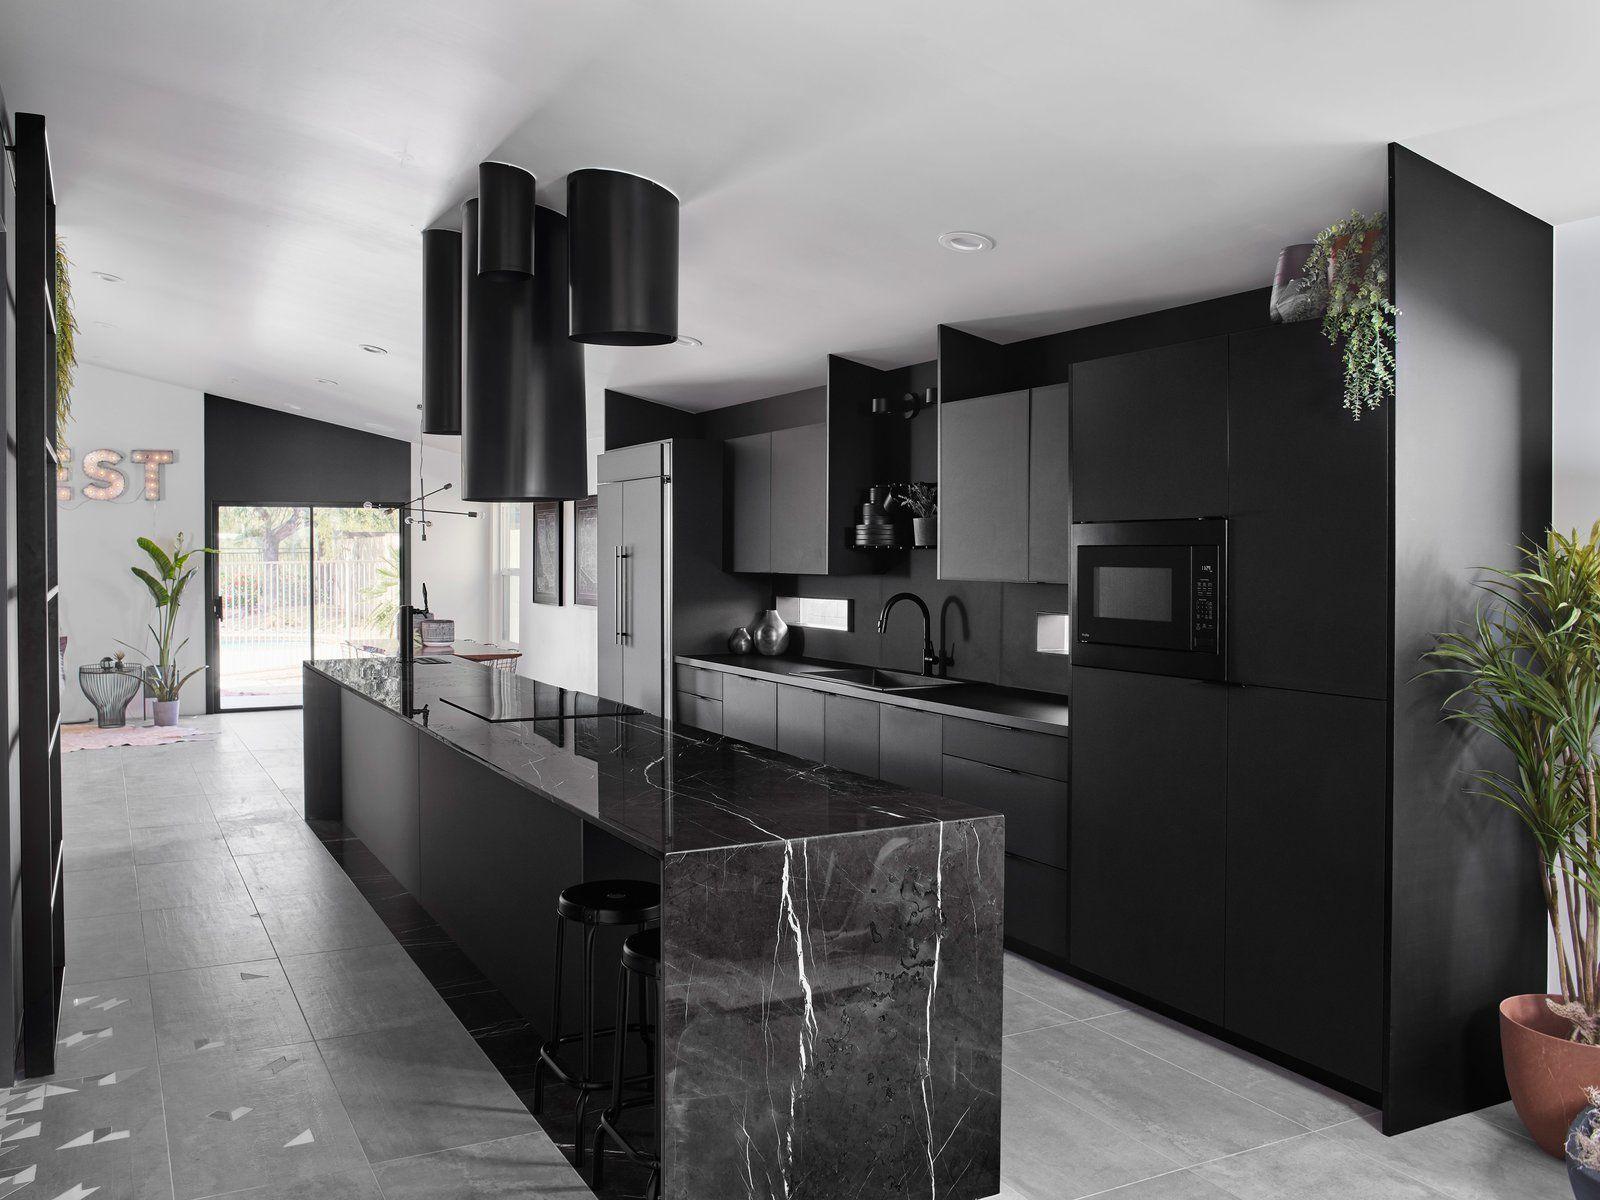 Details In 2020 Laminate Kitchen Laminate Cabinets Cabinet Design